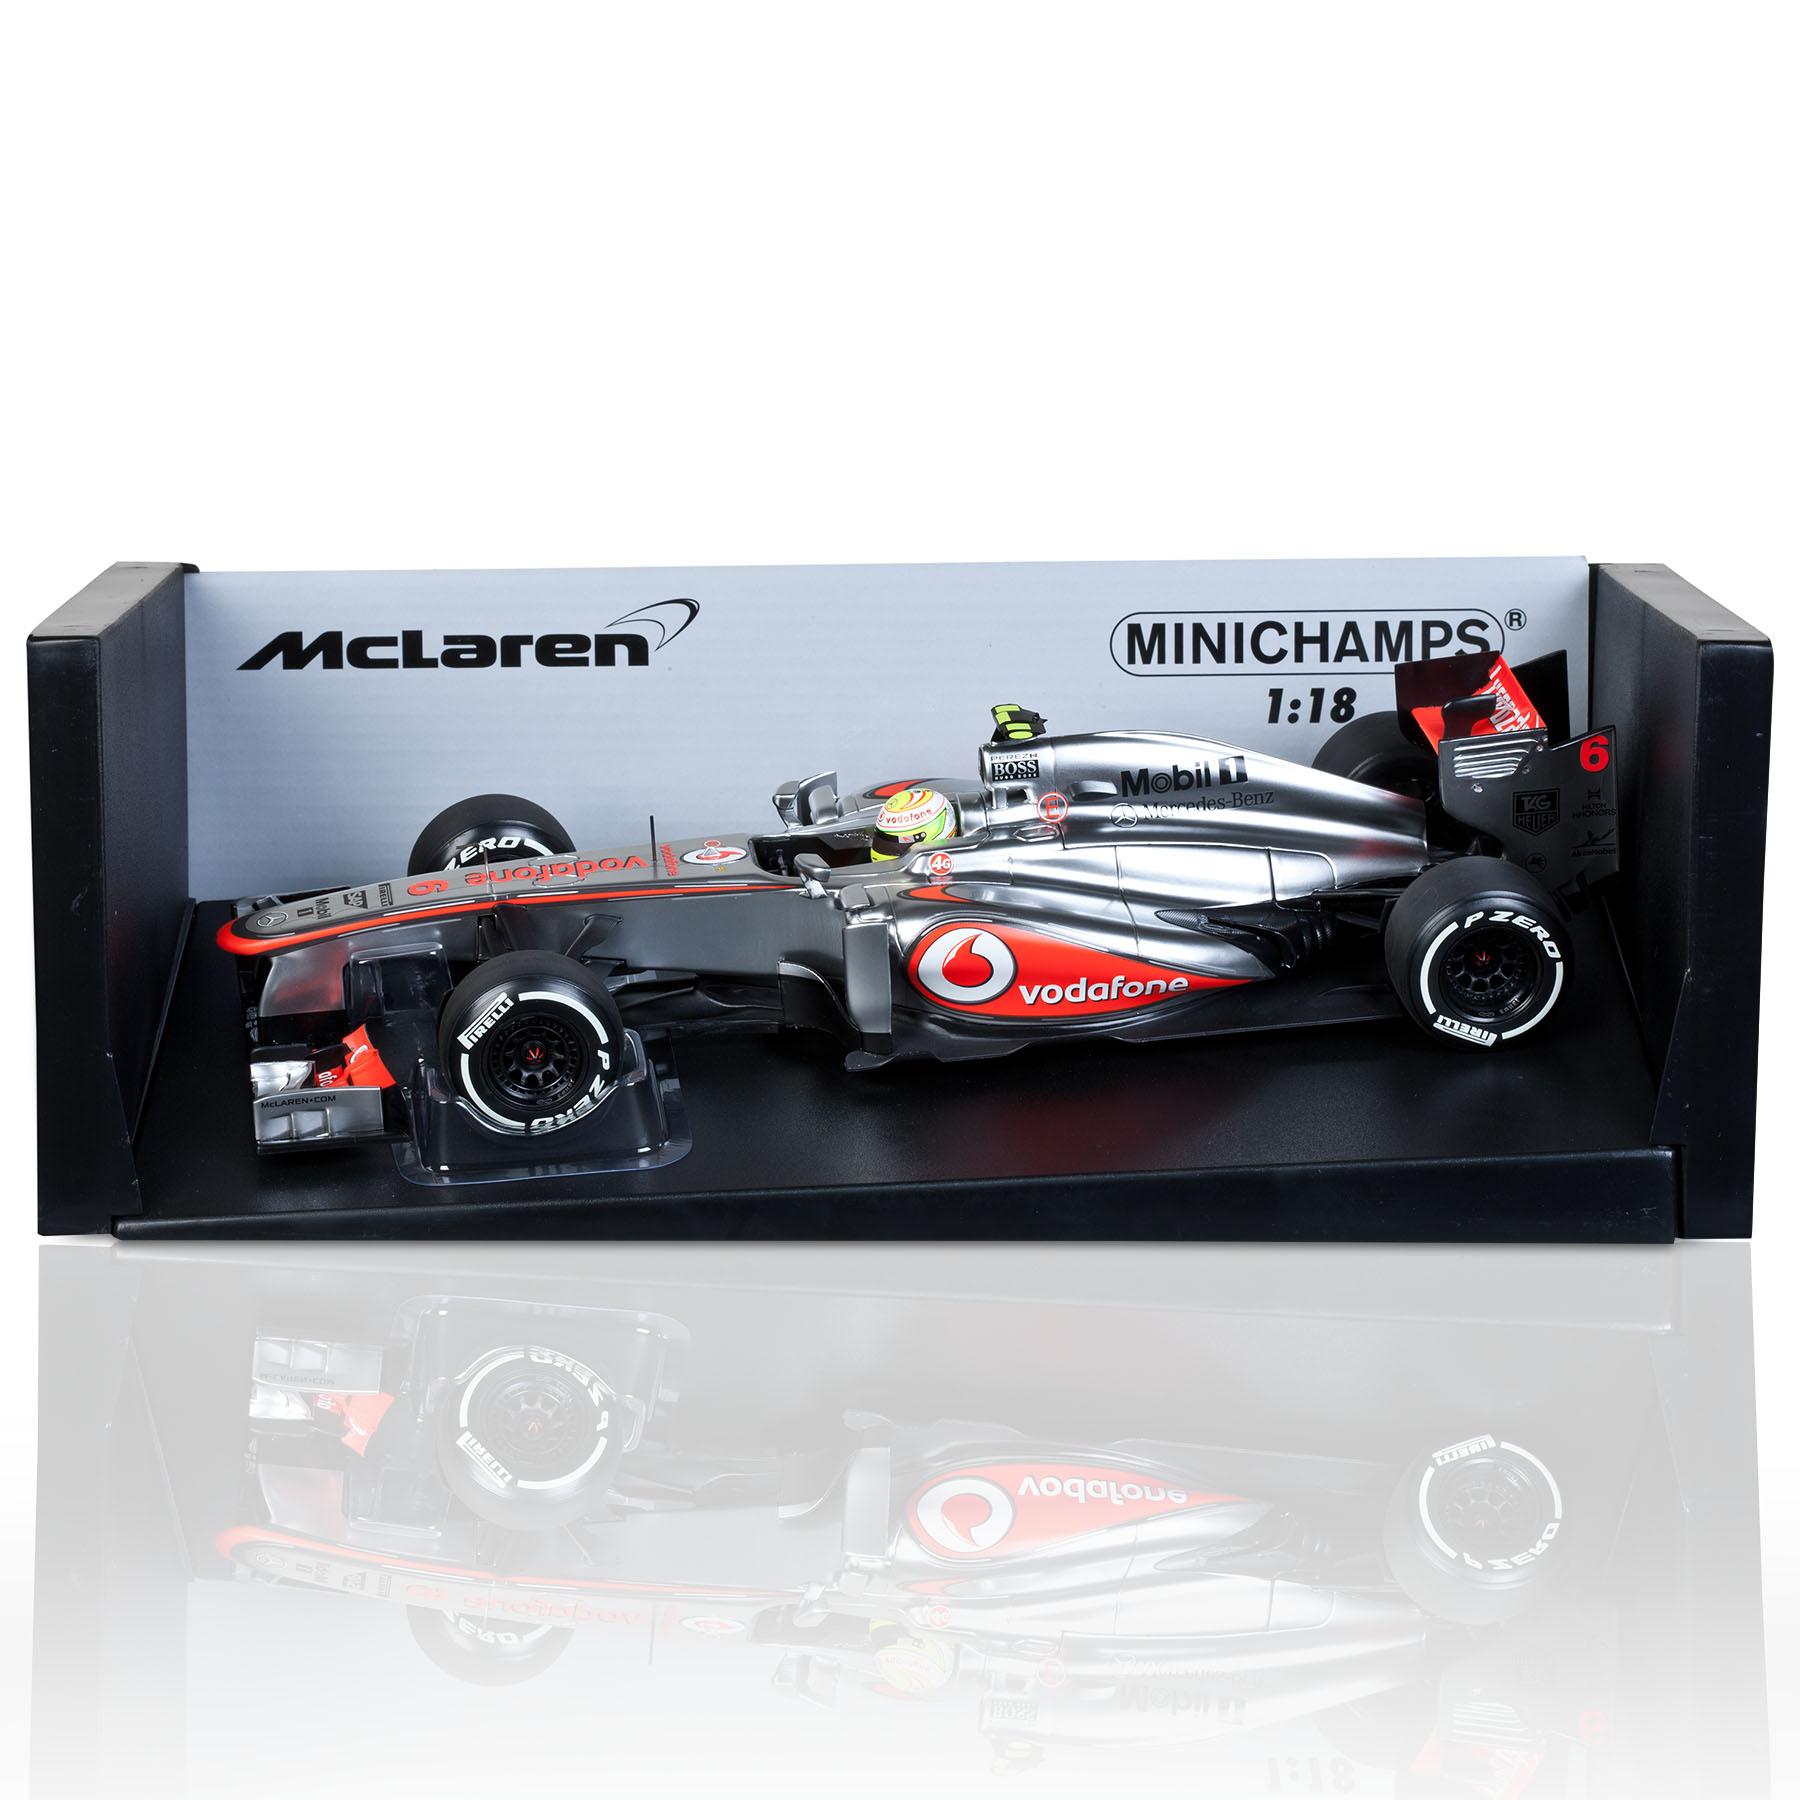 Vodafone McLaren Mercedes MP4-28 Sergio Perez 2013 1:18 Scale